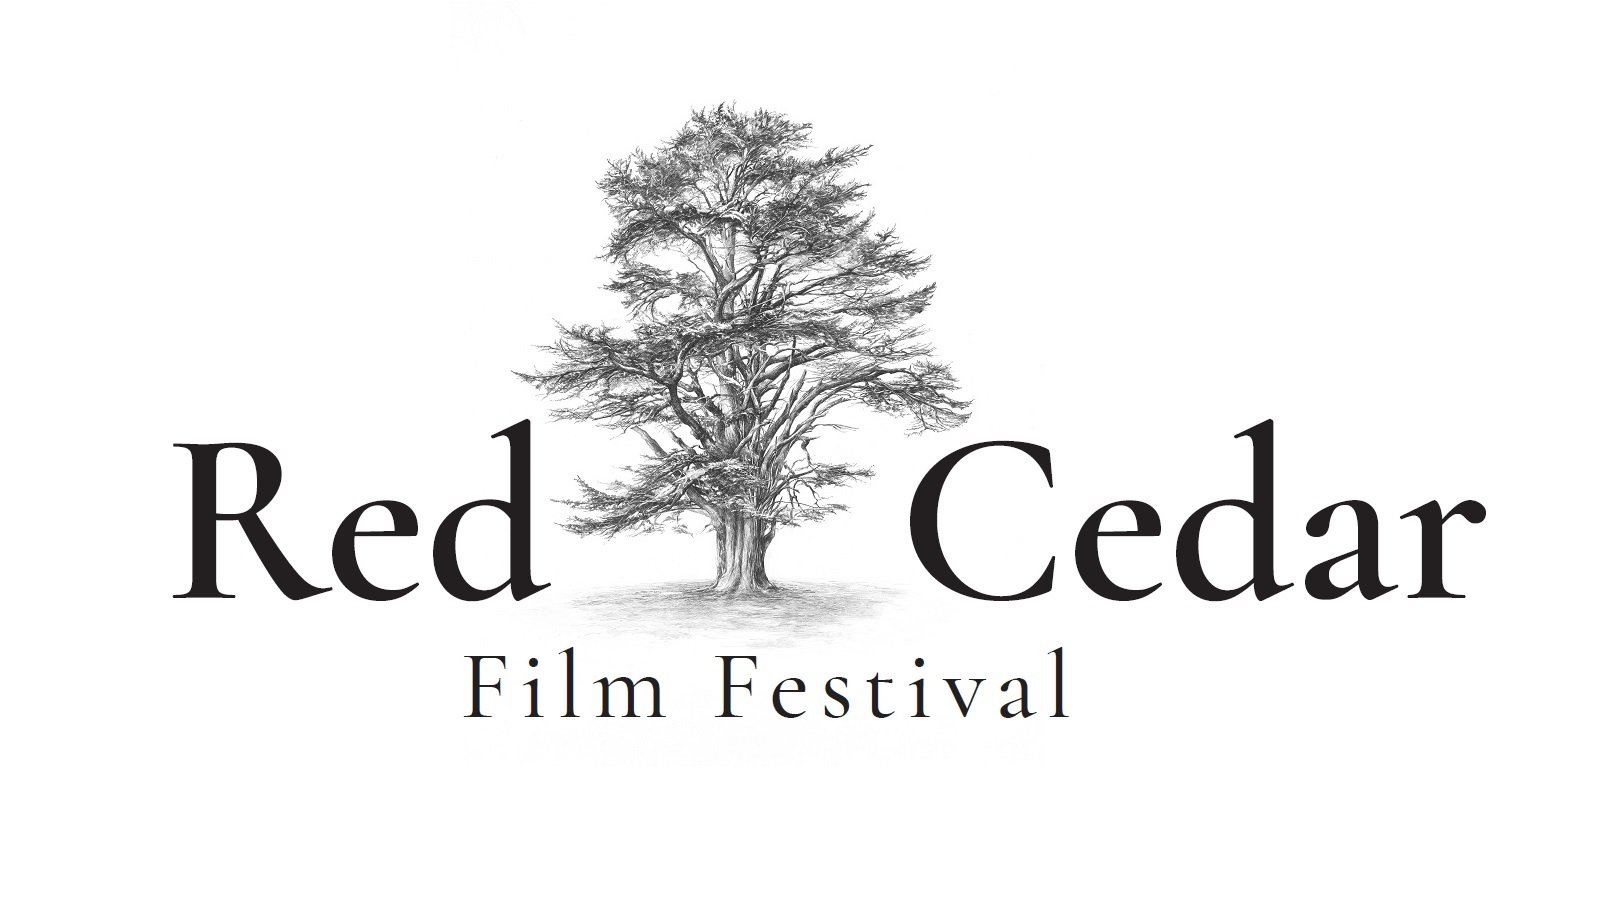 Red Cedar Film Festival